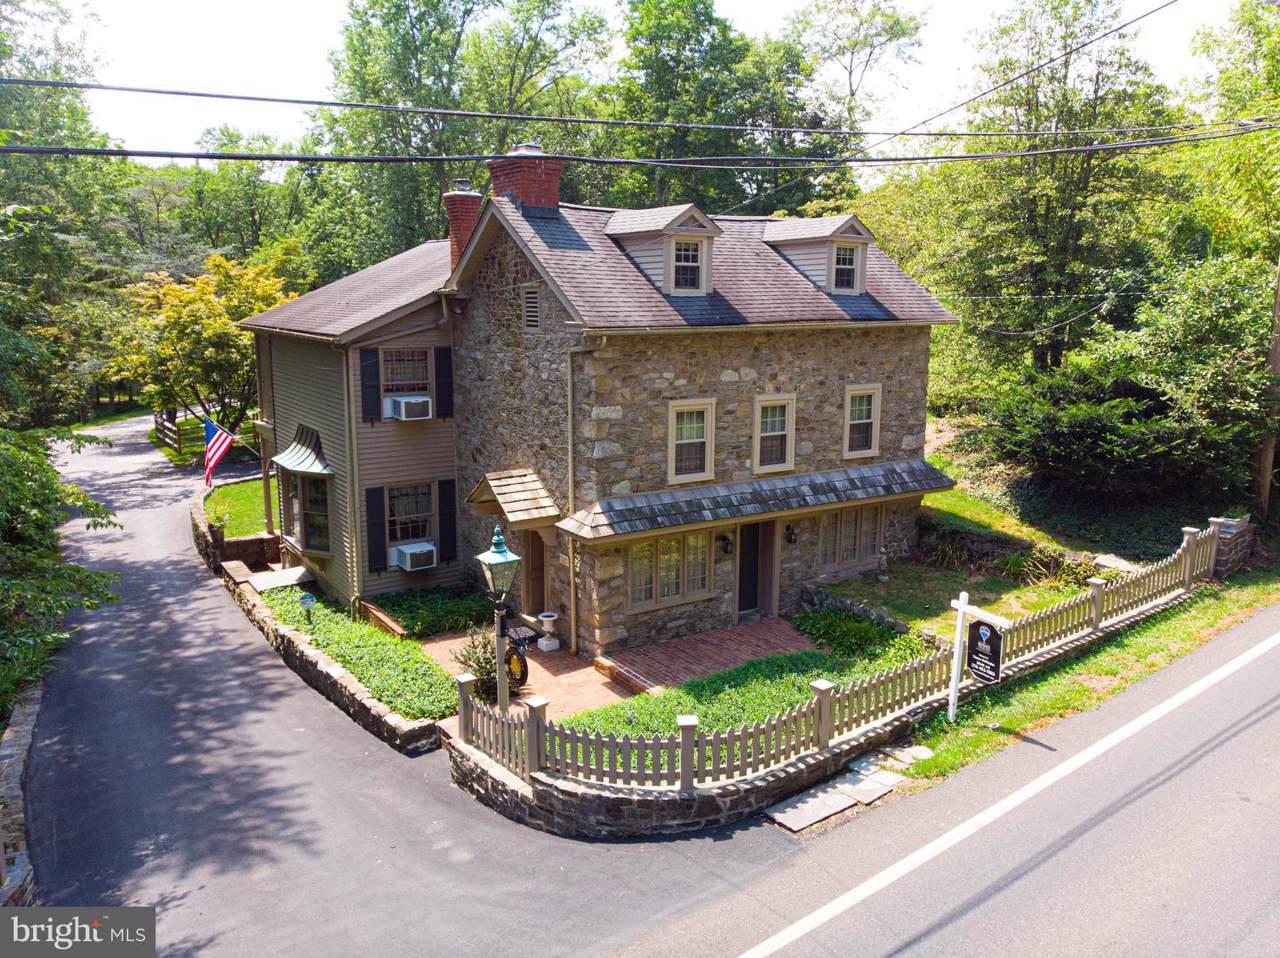 880 Pebble Hill Road - Photo 1